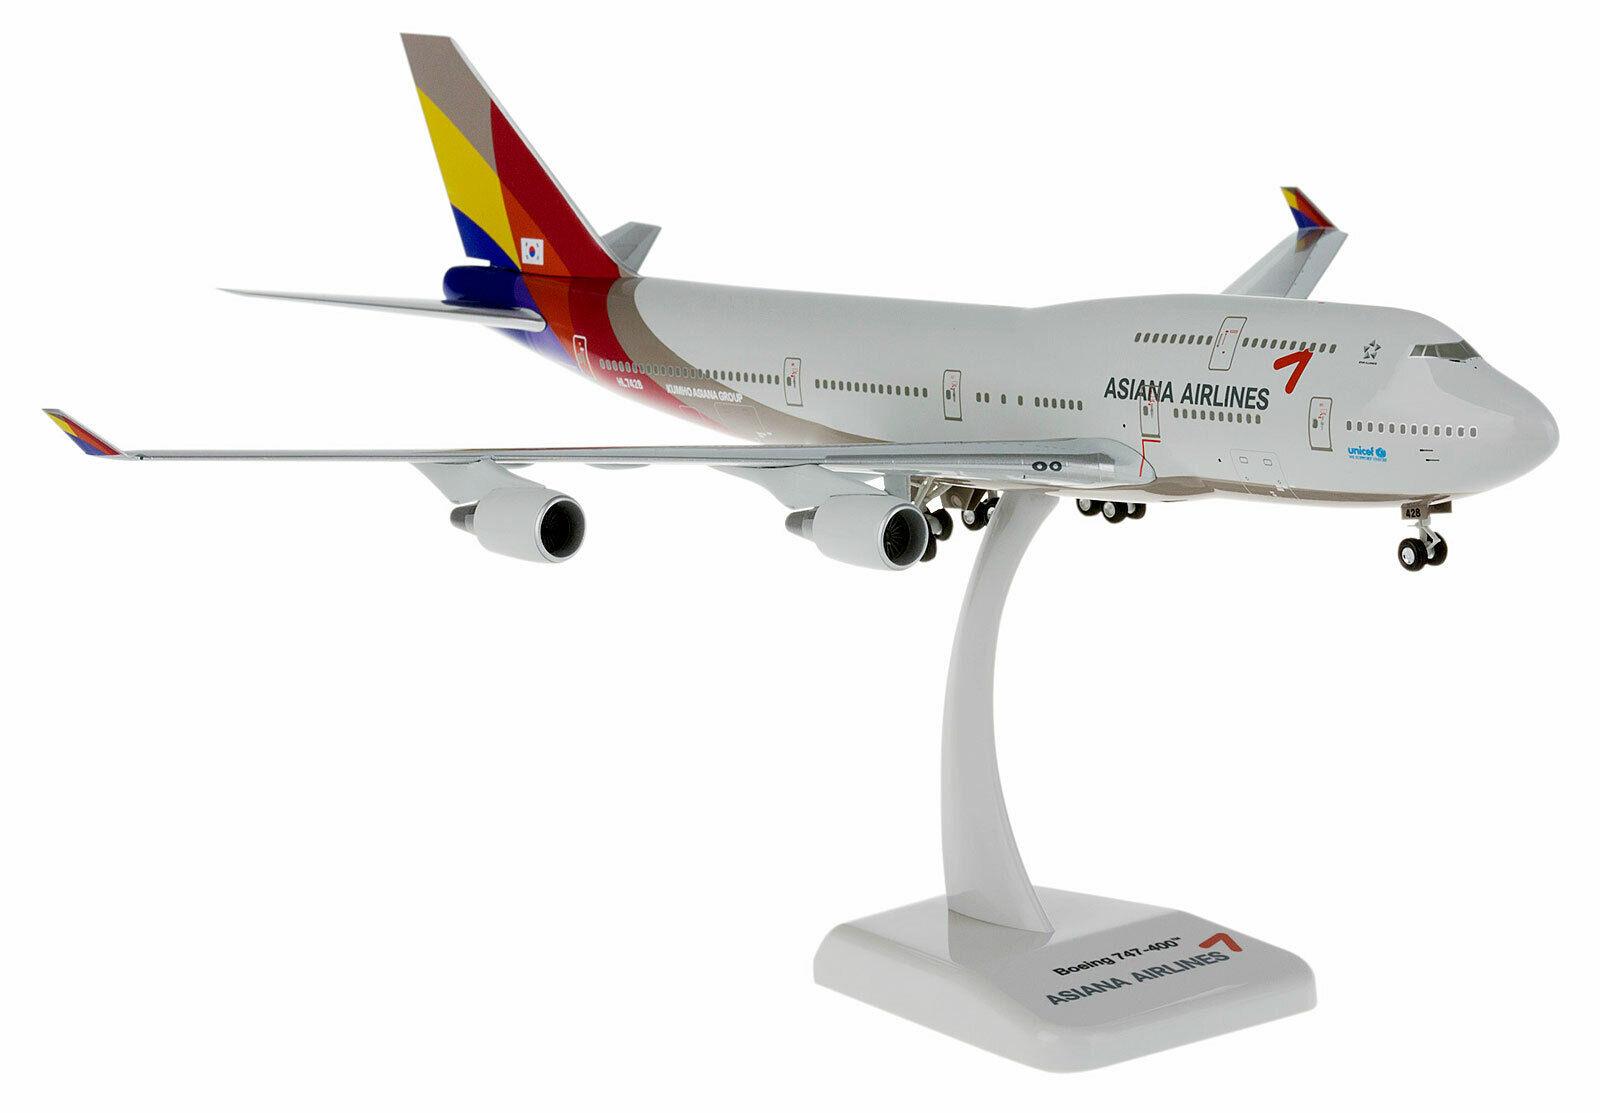 Asiana Airlines Boeing 747-400 1 200 HOGAN Wings aereo modello b747 NUOVO 3985